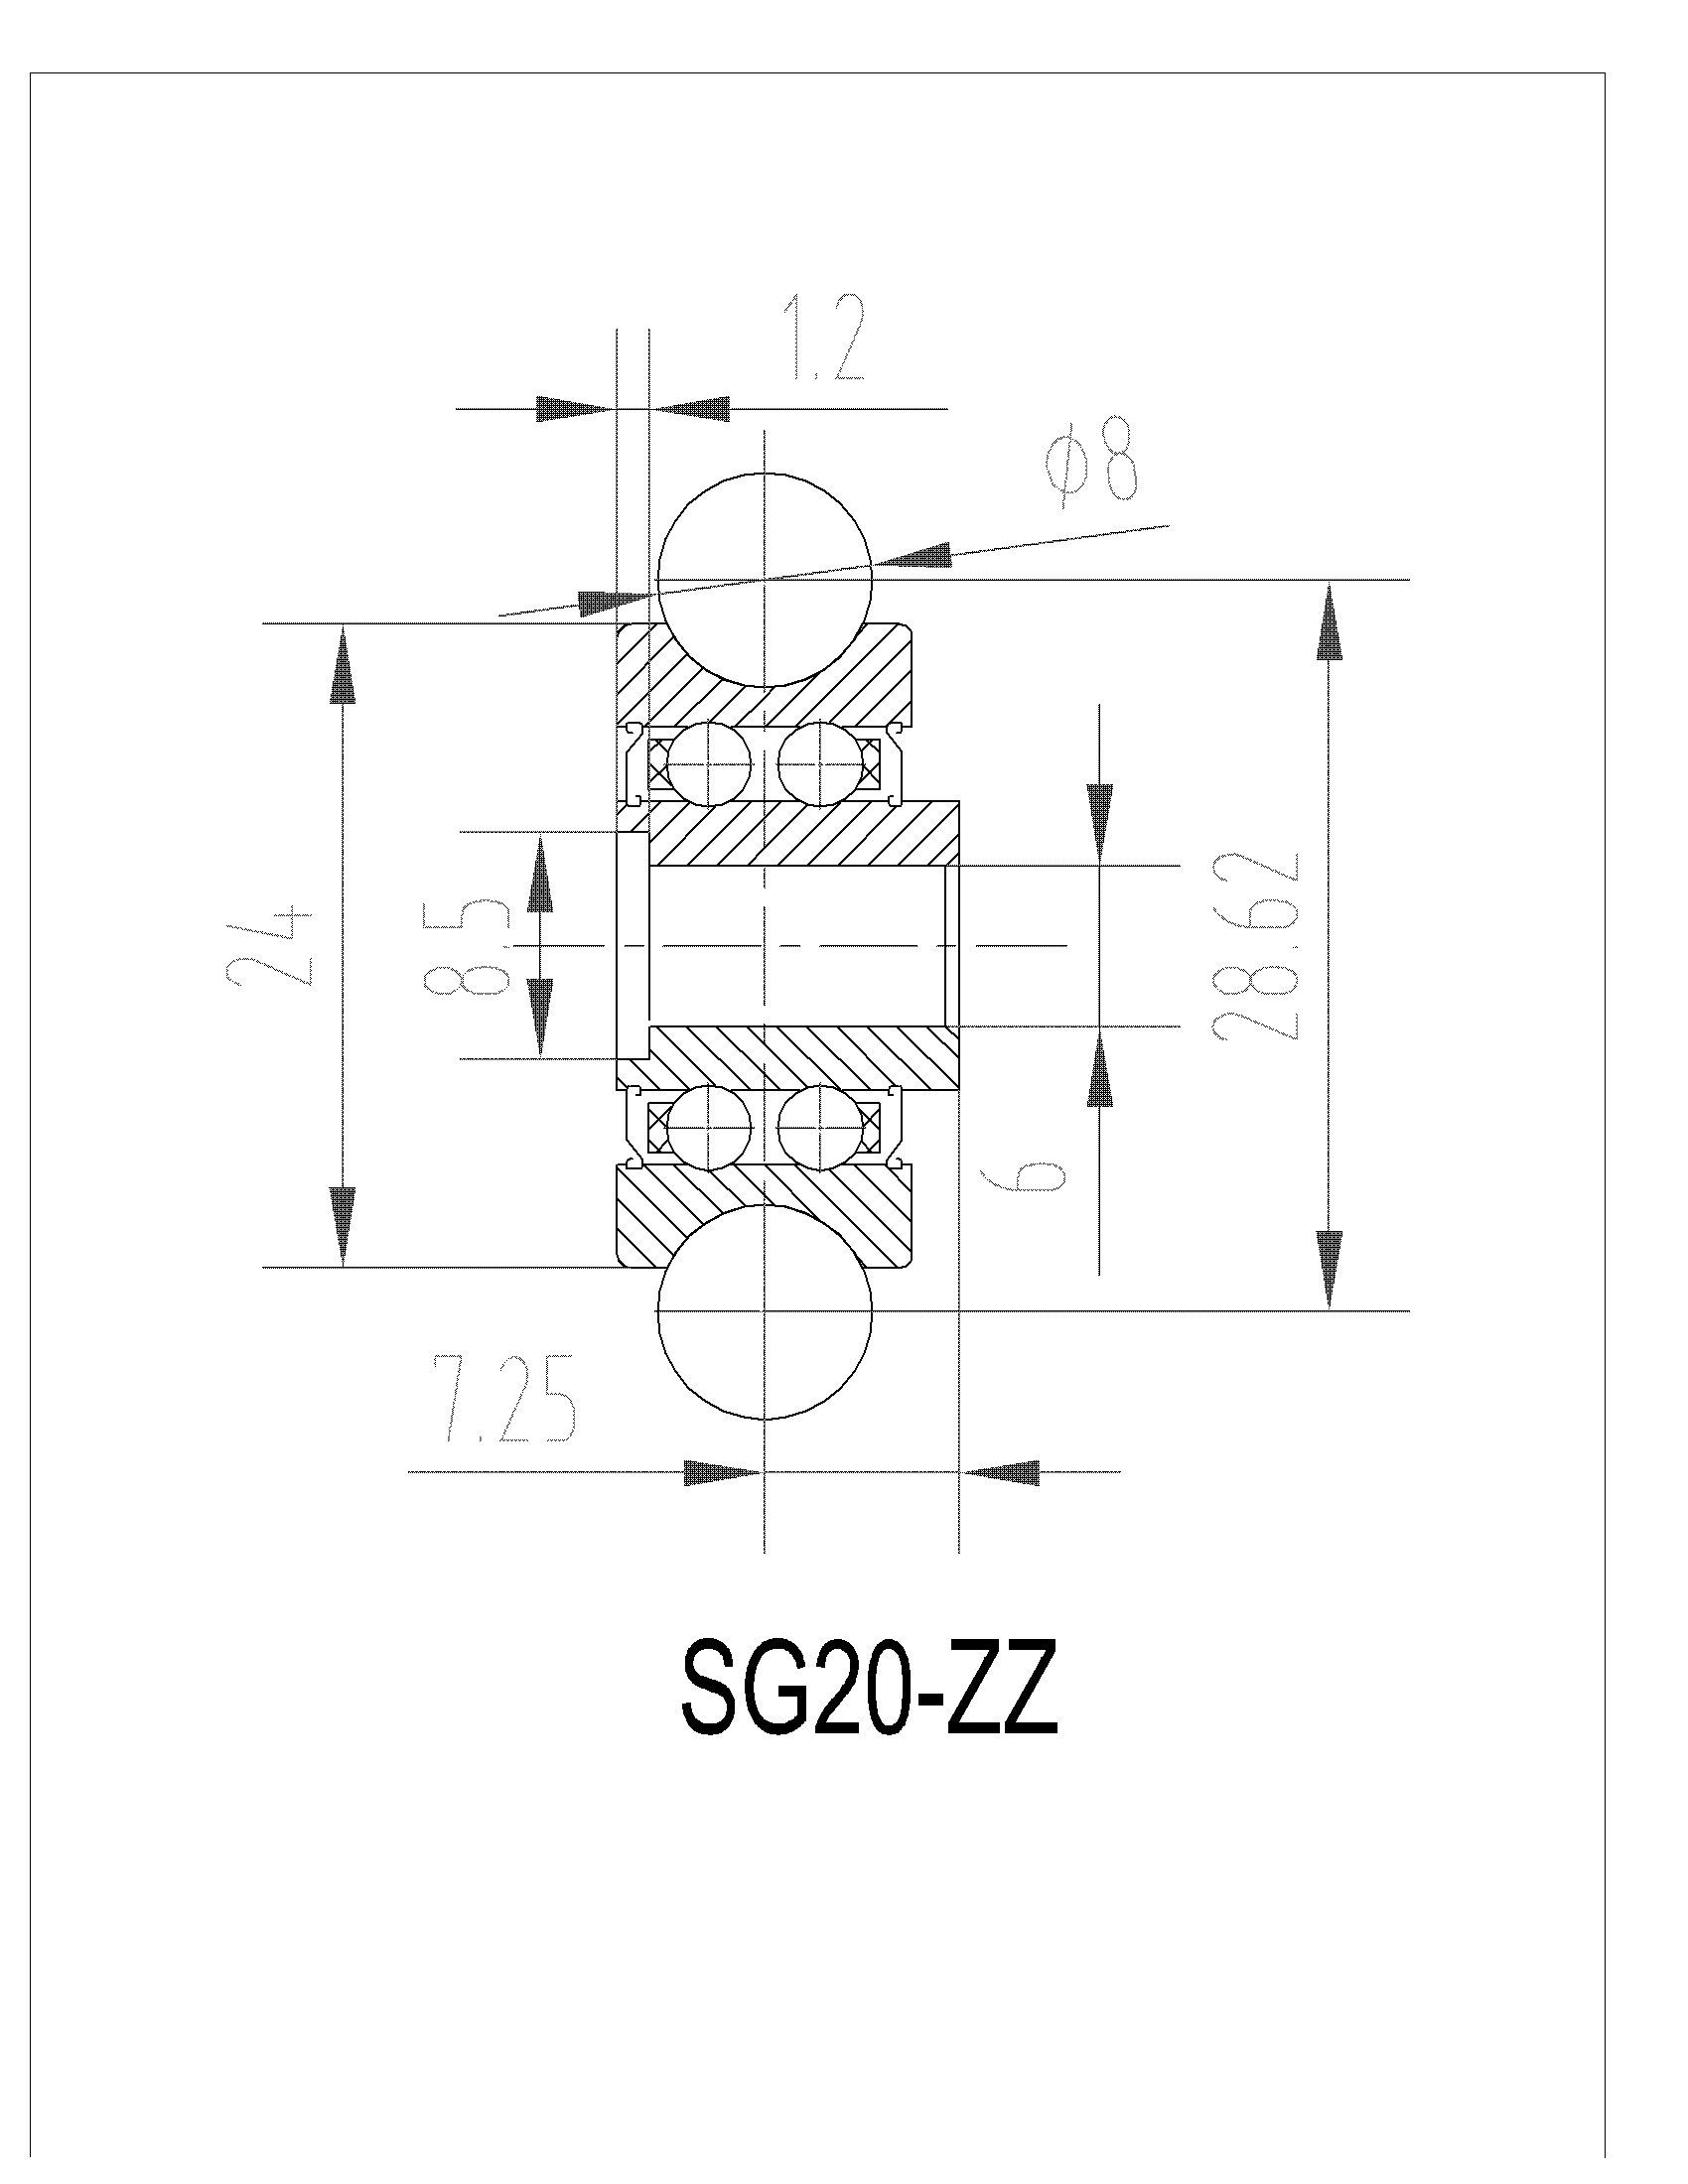 Rodamiento De Rodillos De La Pista Sg20zz Rodamiento